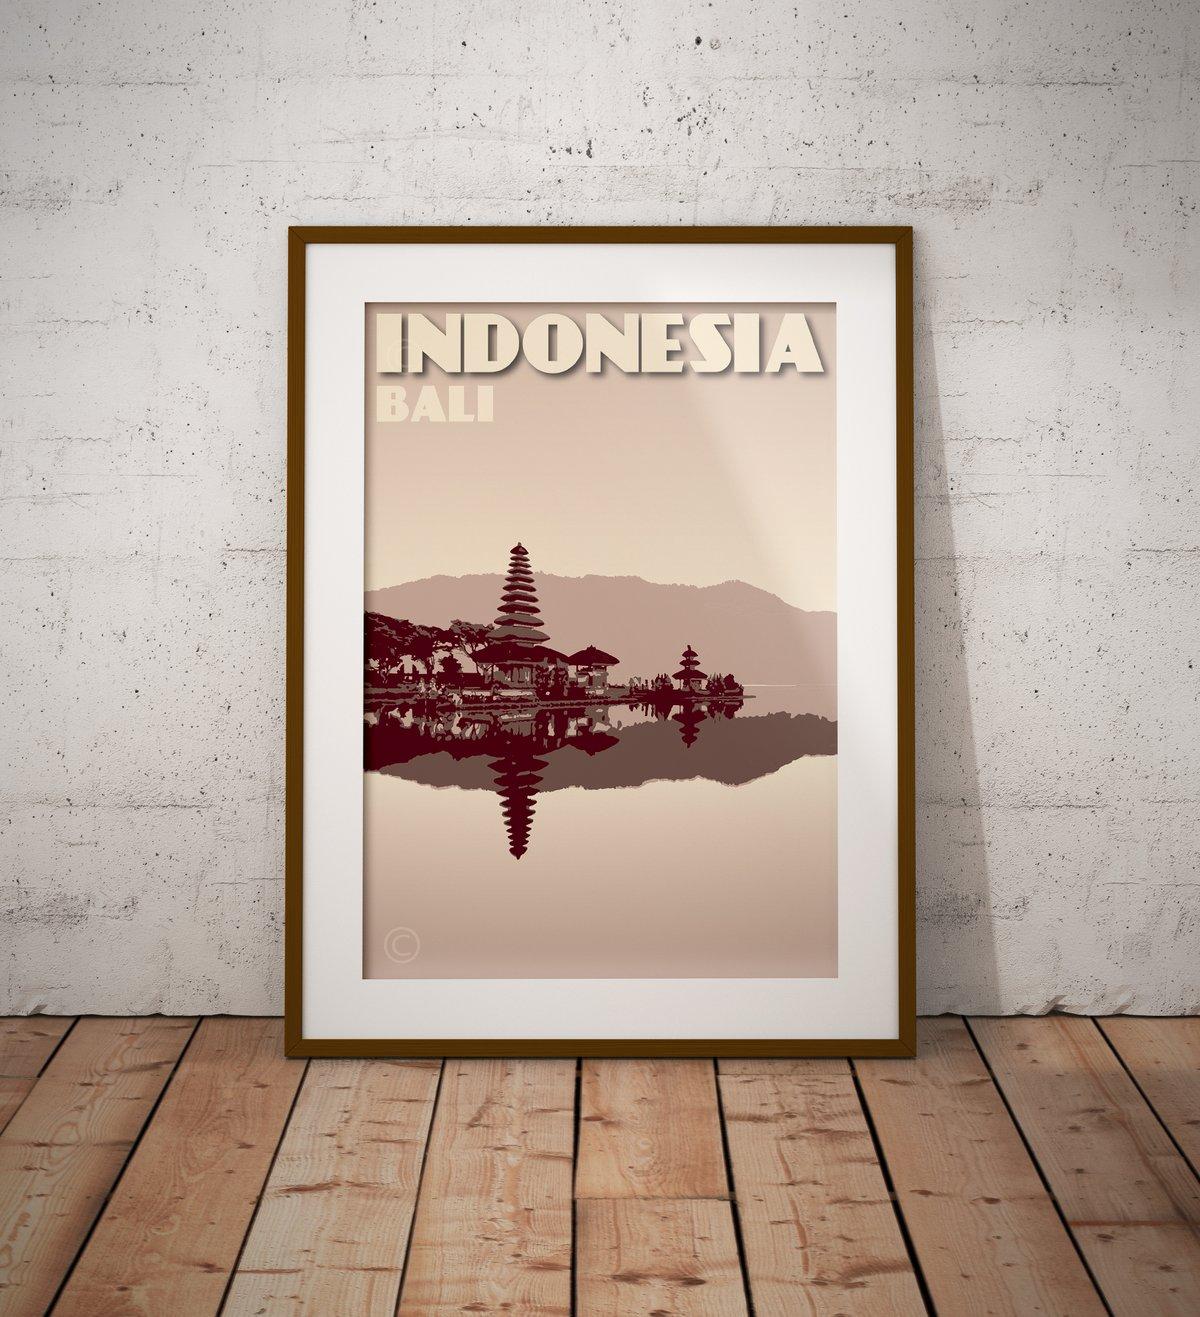 Image of Vintage poster Indonesia - Bali - Pura Ulun Danu Bratan - Clay - Fine Art Print